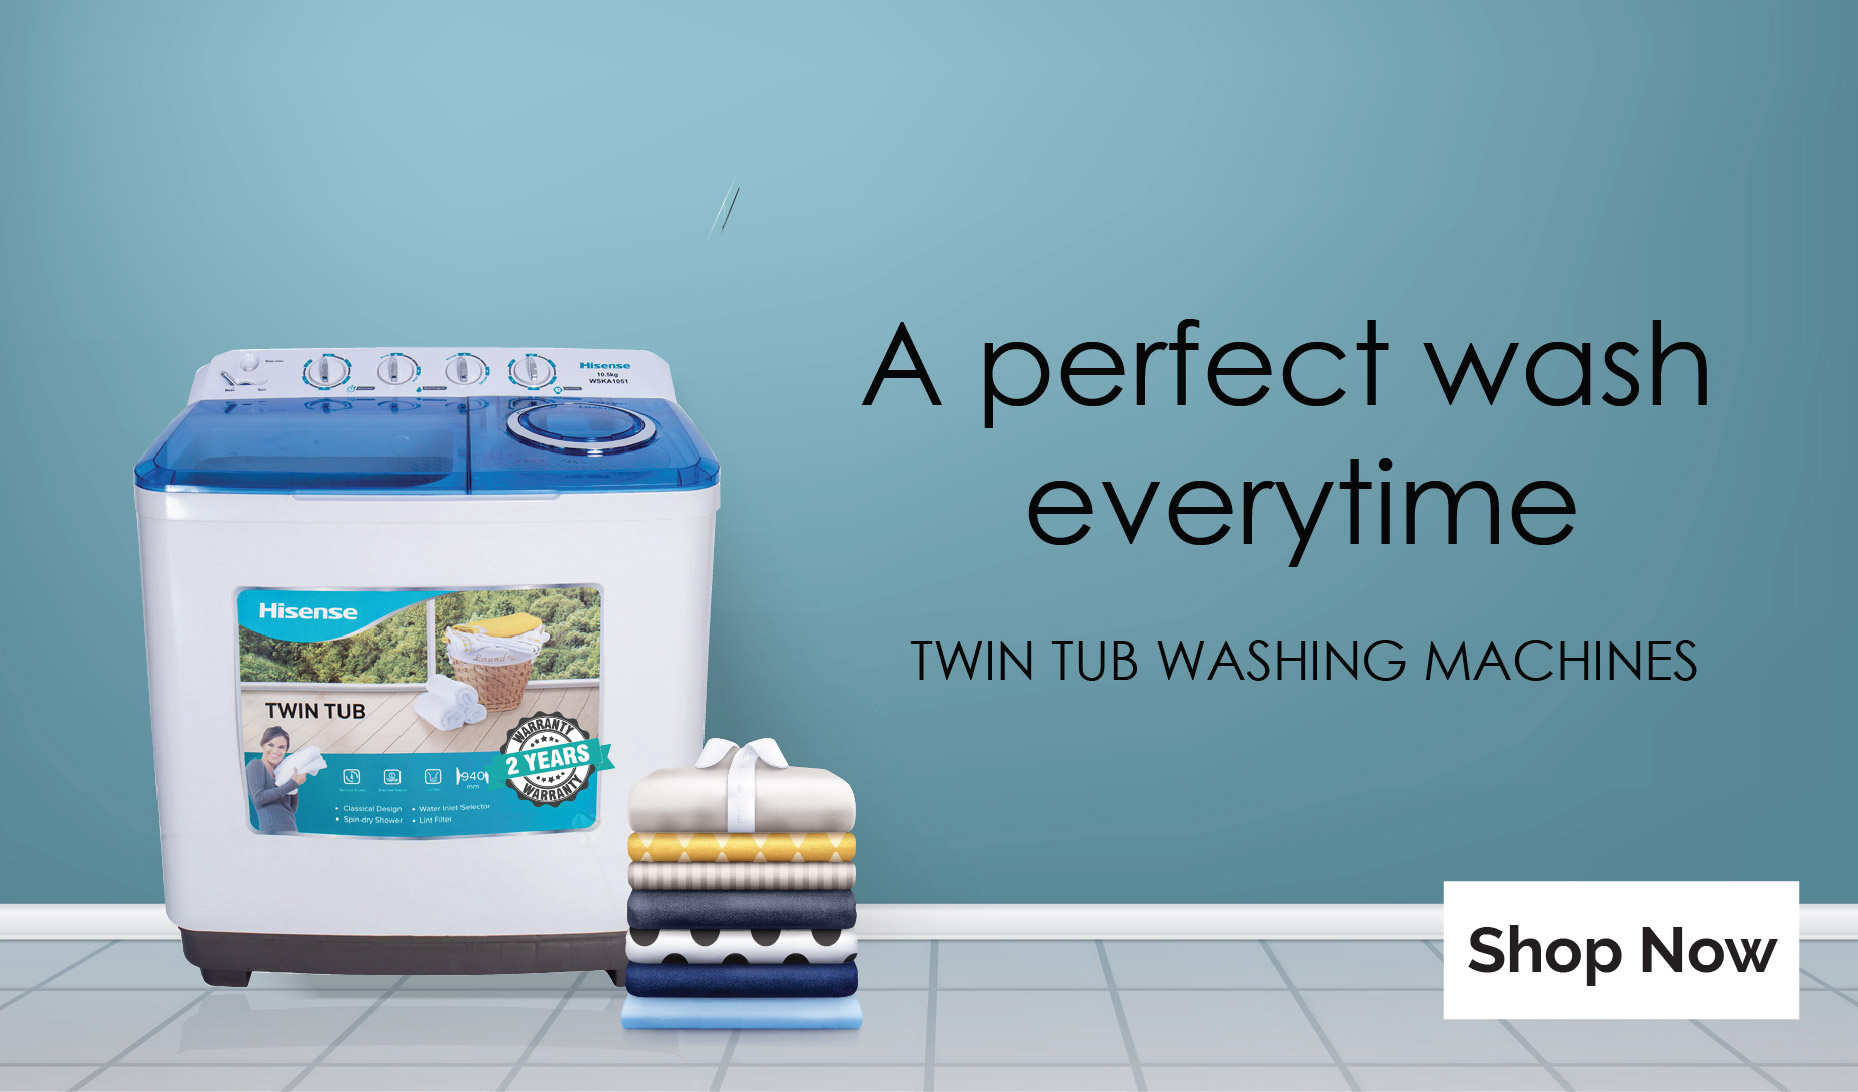 Hisense twin tub